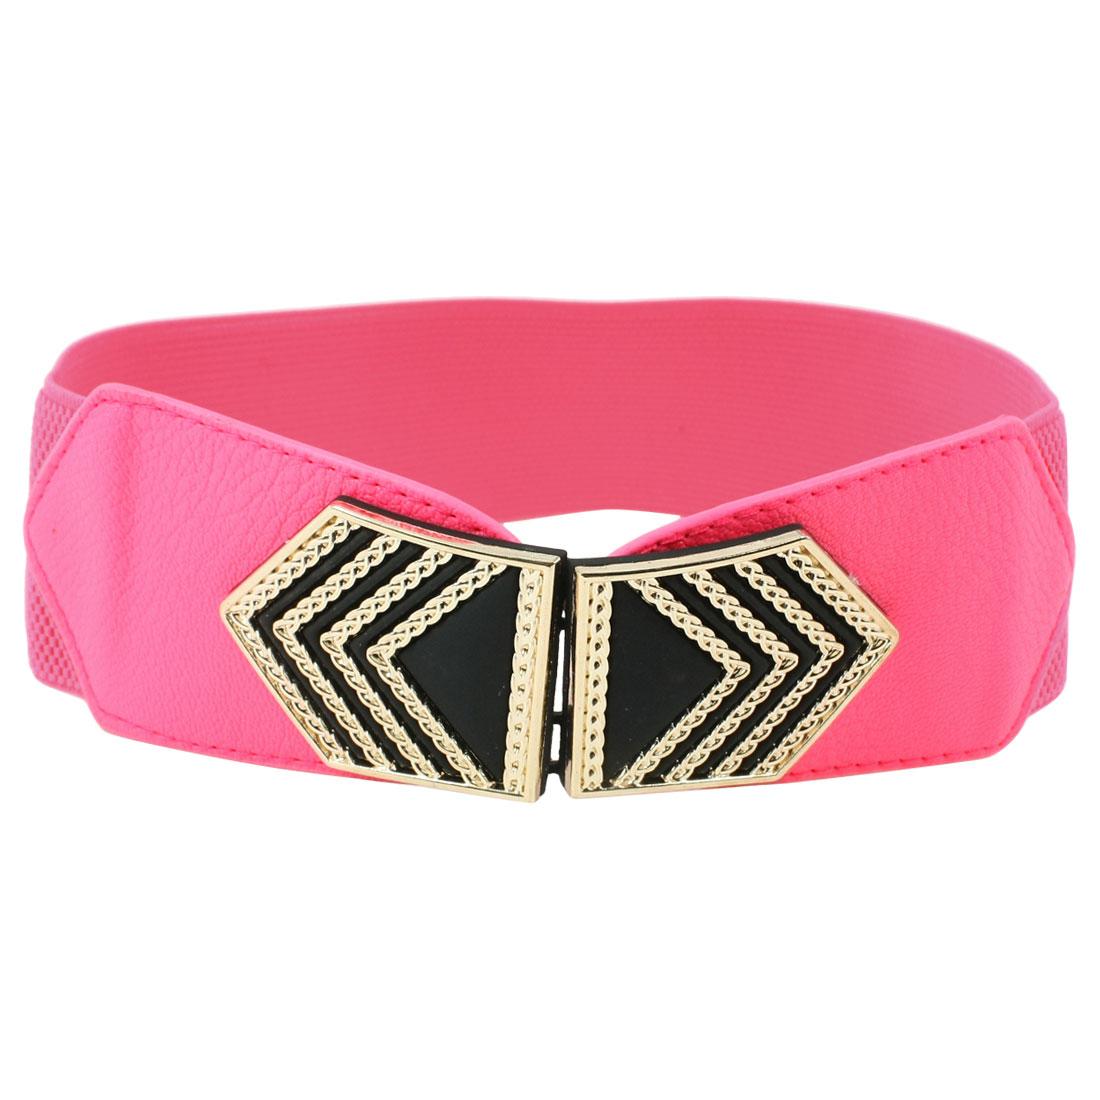 Women Arrow Design Metal Interlocking Buckle Elastic Waist Belt Band Hot Pink